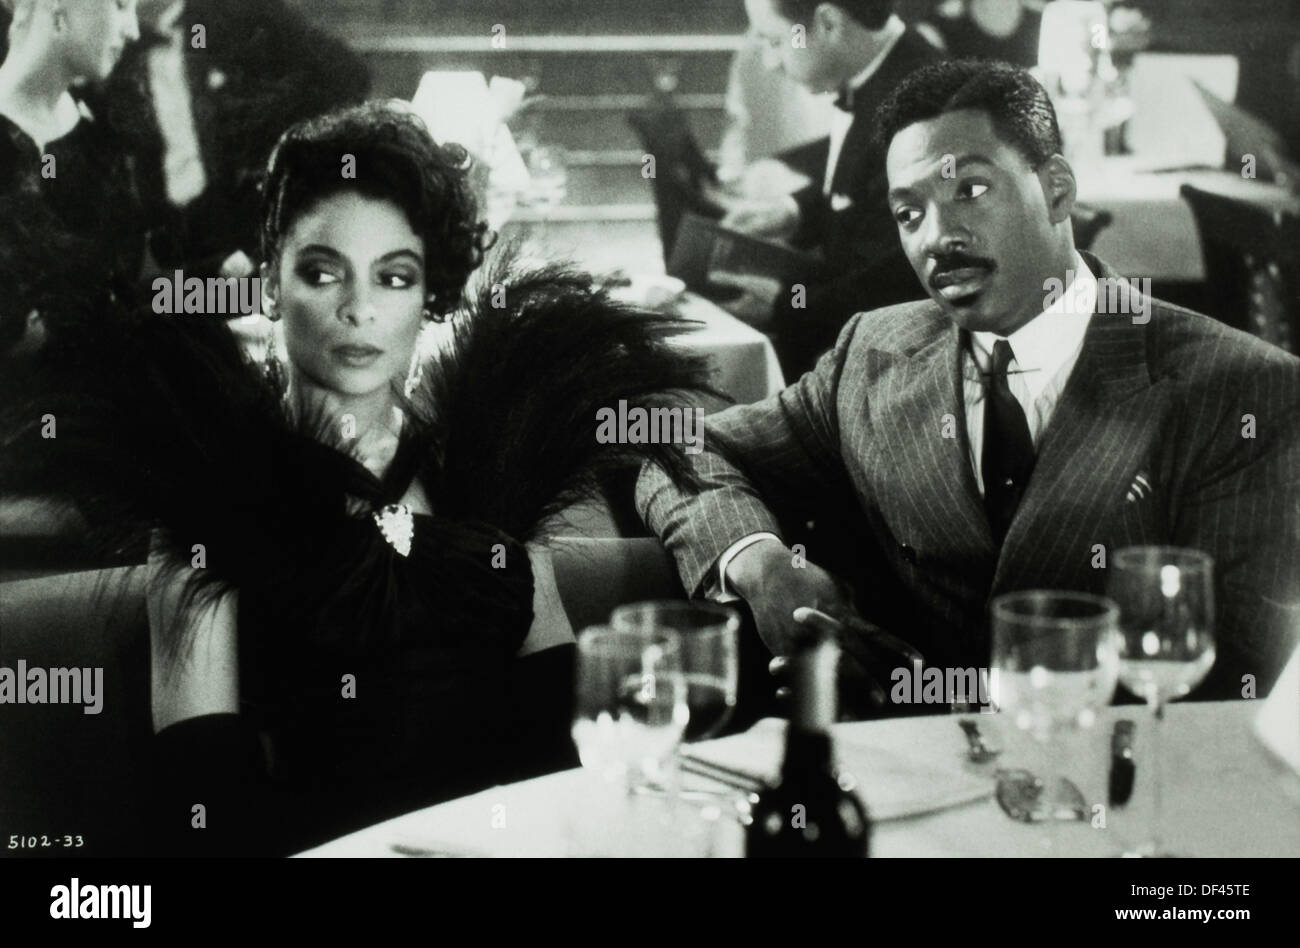 d55b2e1dd82 Eddie Murphy Jasmine Guy Harlem Stock Photos   Eddie Murphy Jasmine ...